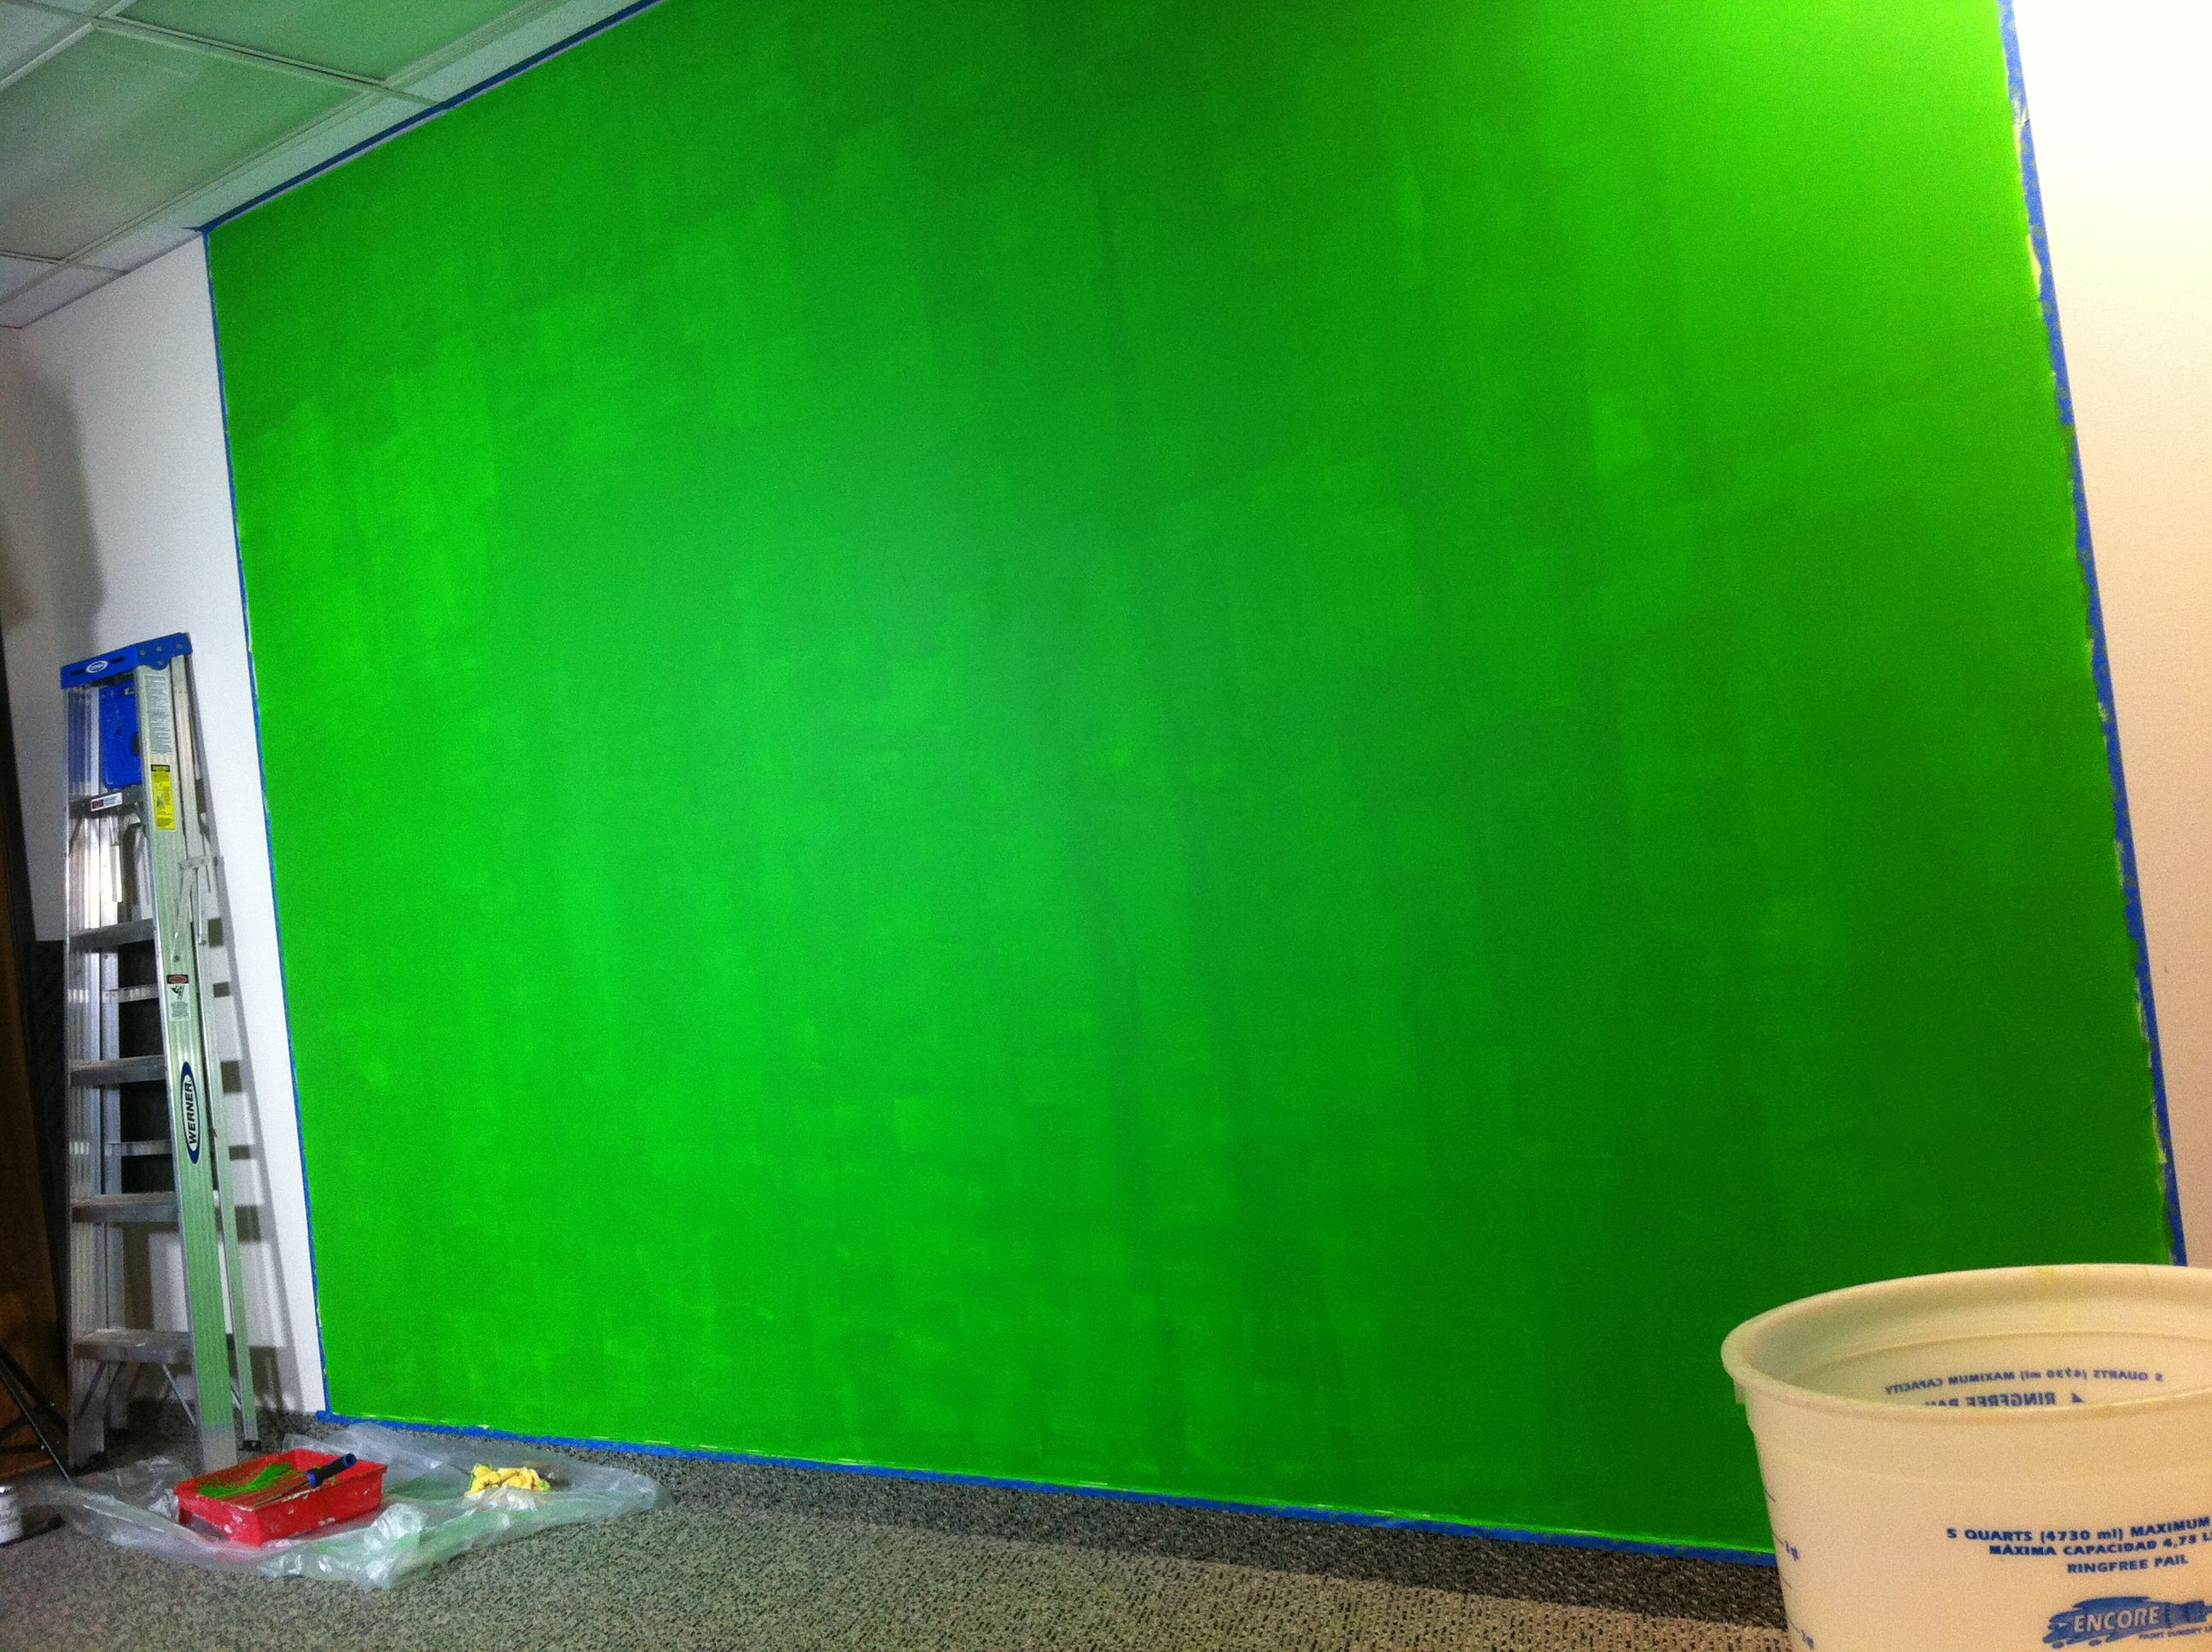 neon green paint walls chroma key green screen wall